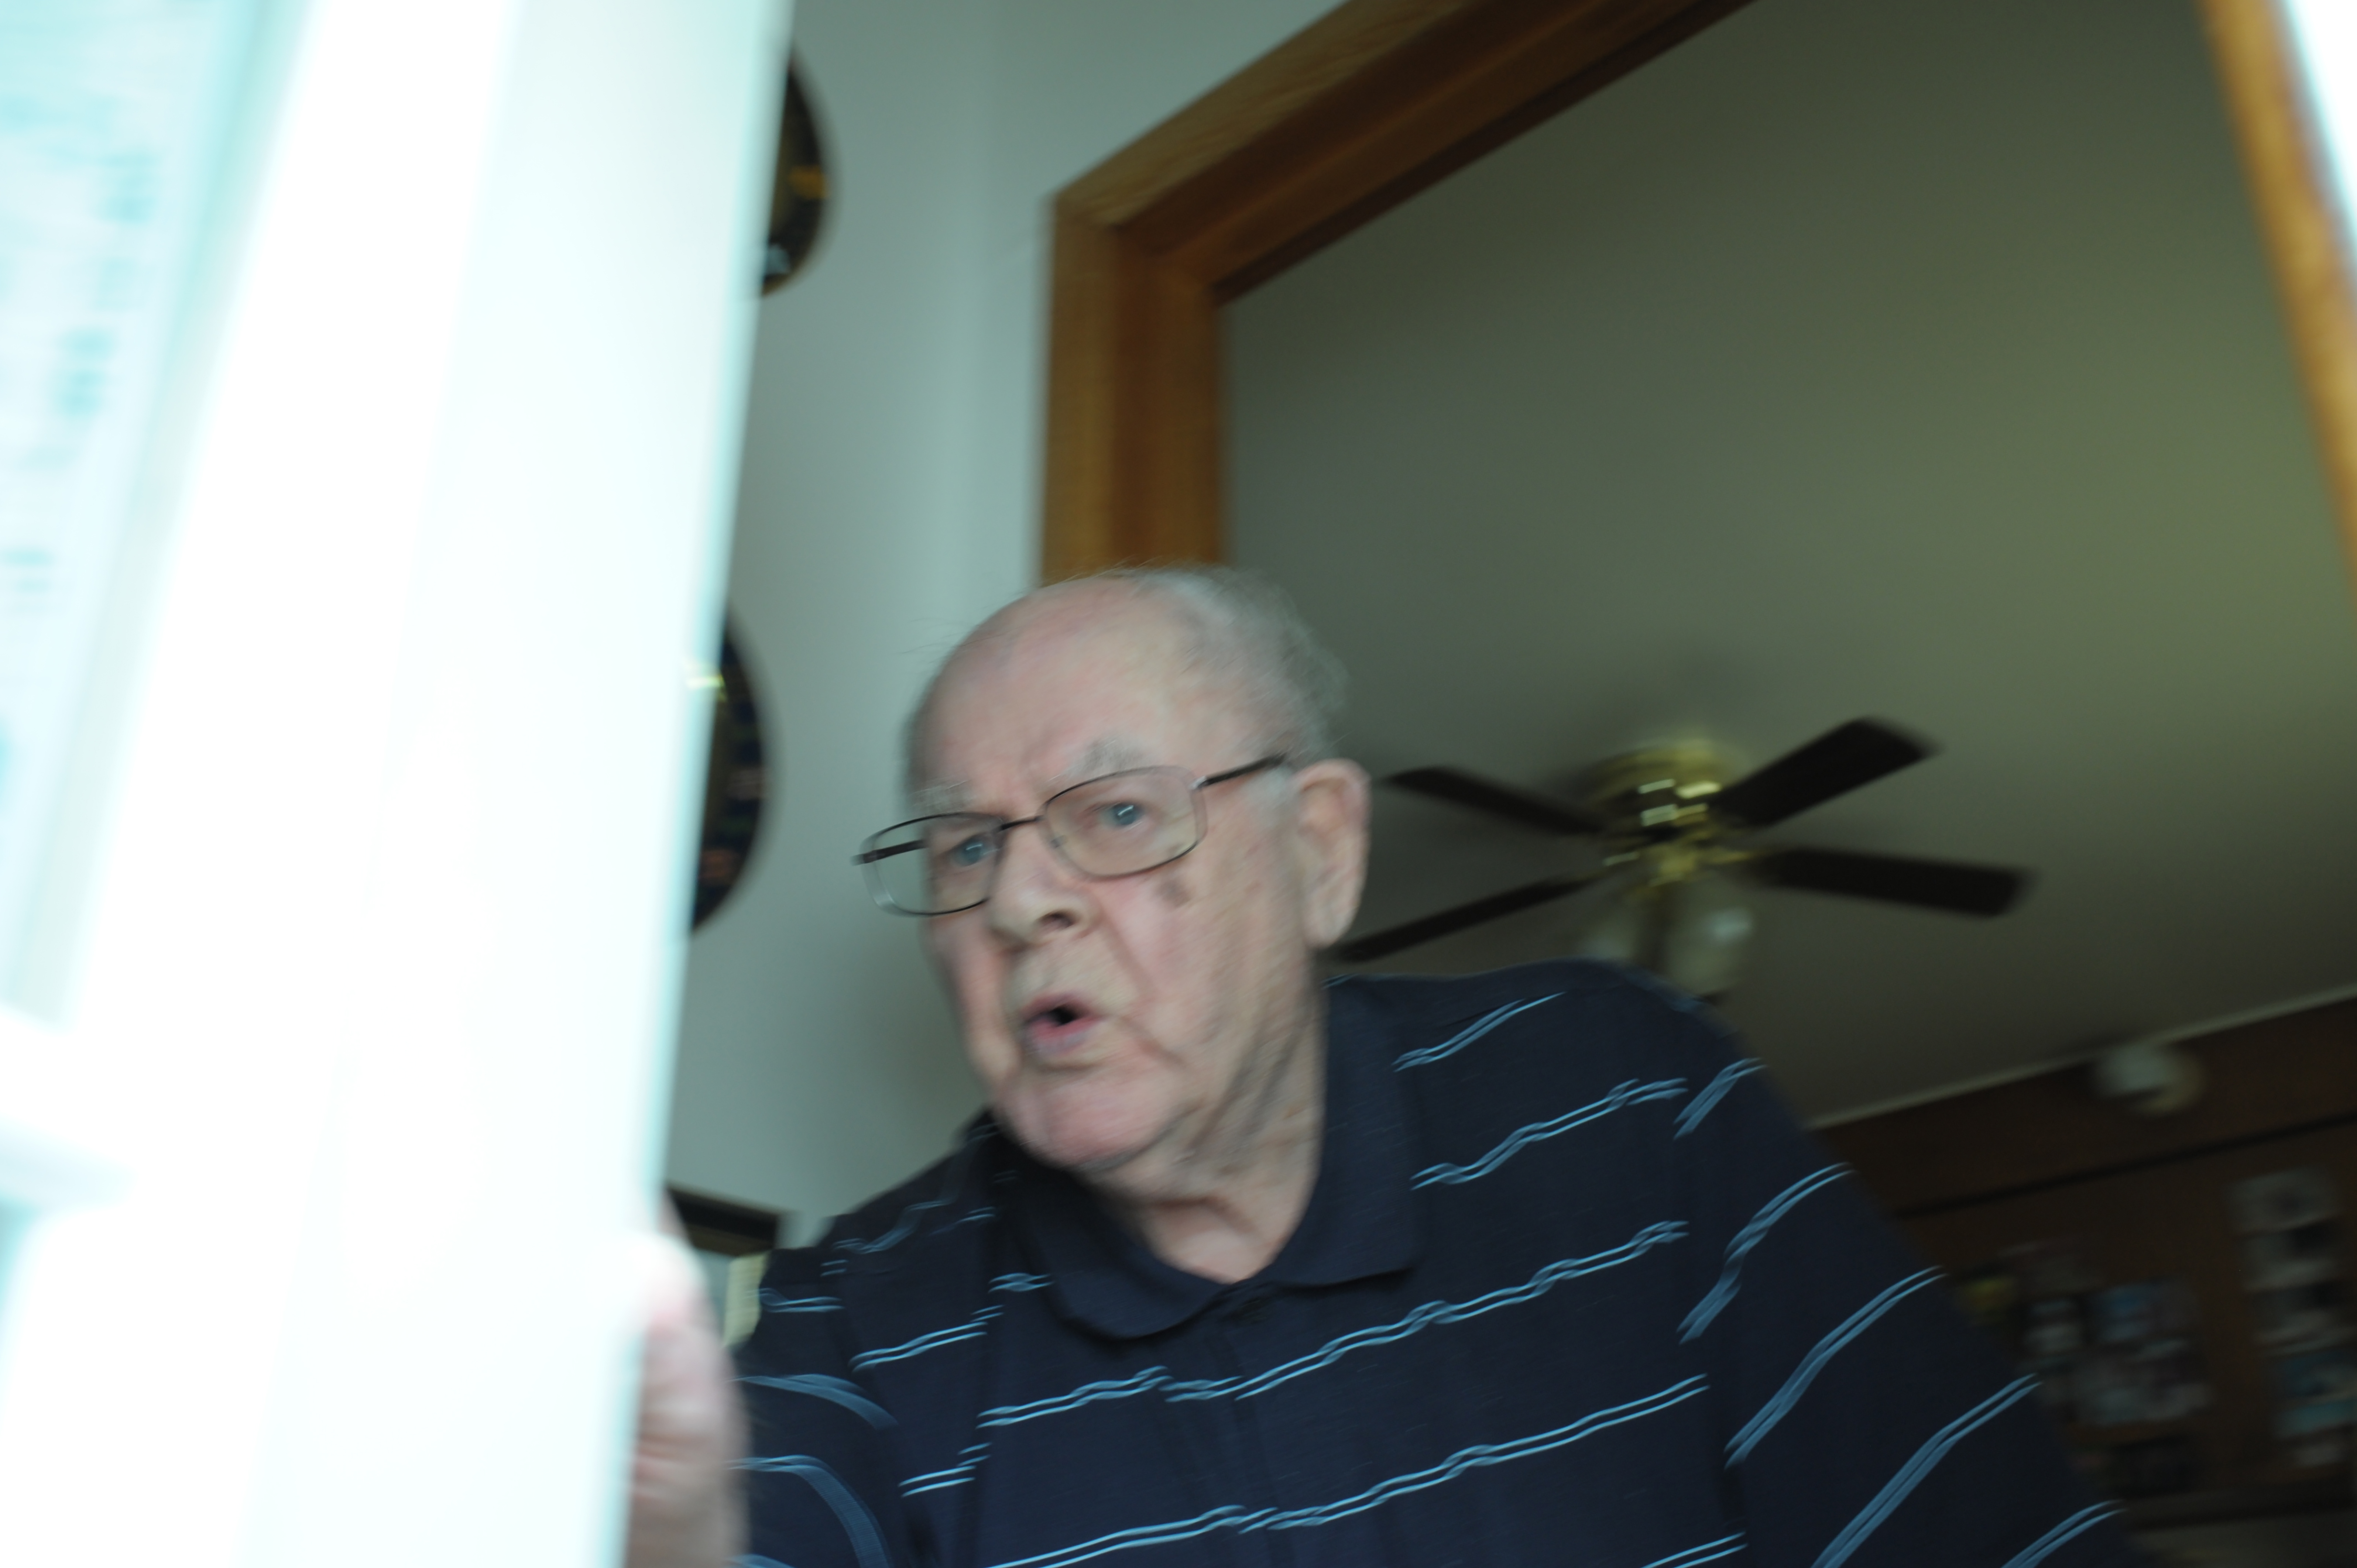 Rev. Robert MacKenzie has retired from St. Patrick's Roman Catholic church in Cupar, Saskatchewan but still lives in the church's rectory.